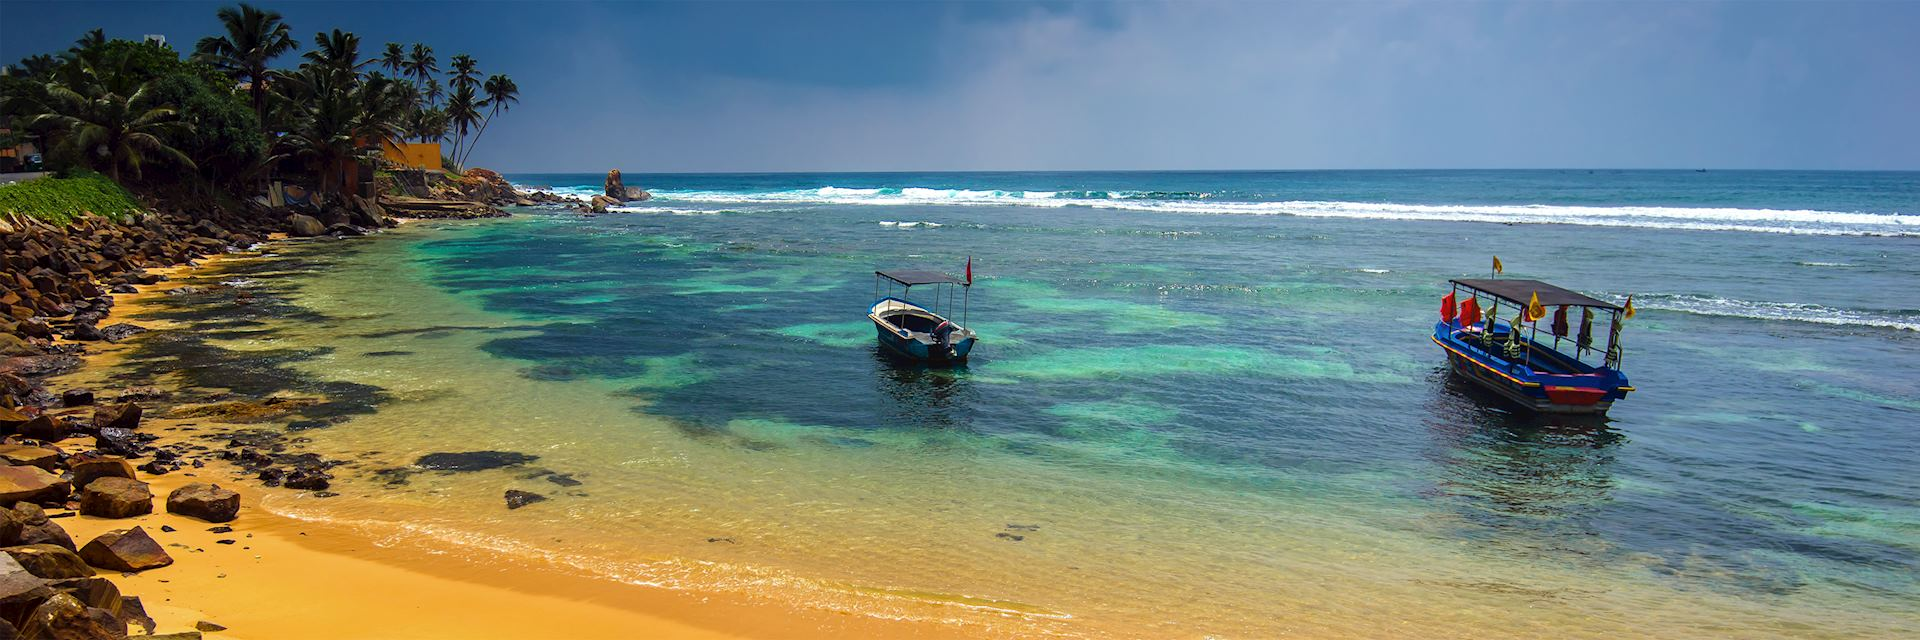 Enjoy Sri Lanka's beaches